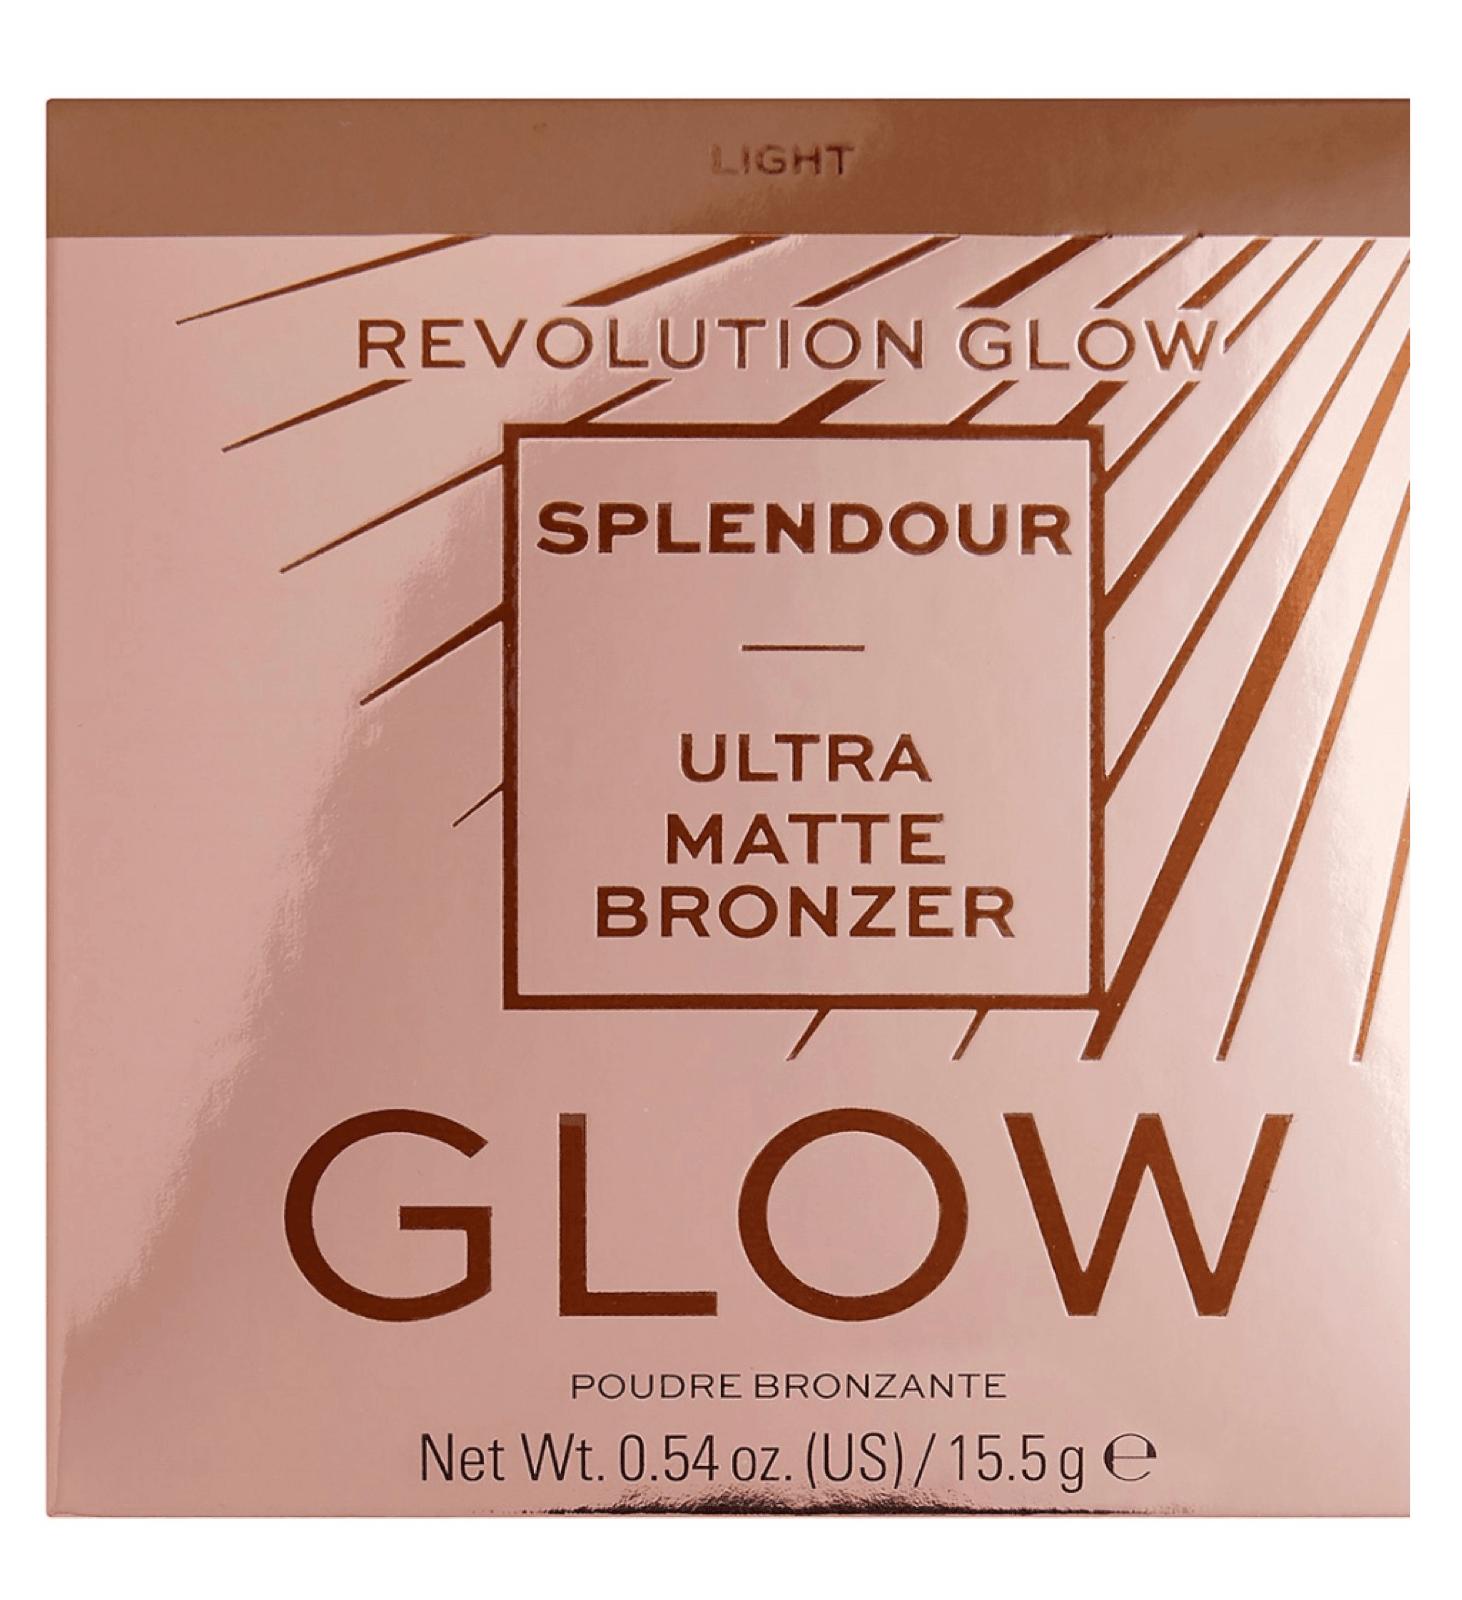 Revolution Glow Splendour Ultra Matte Bronzer